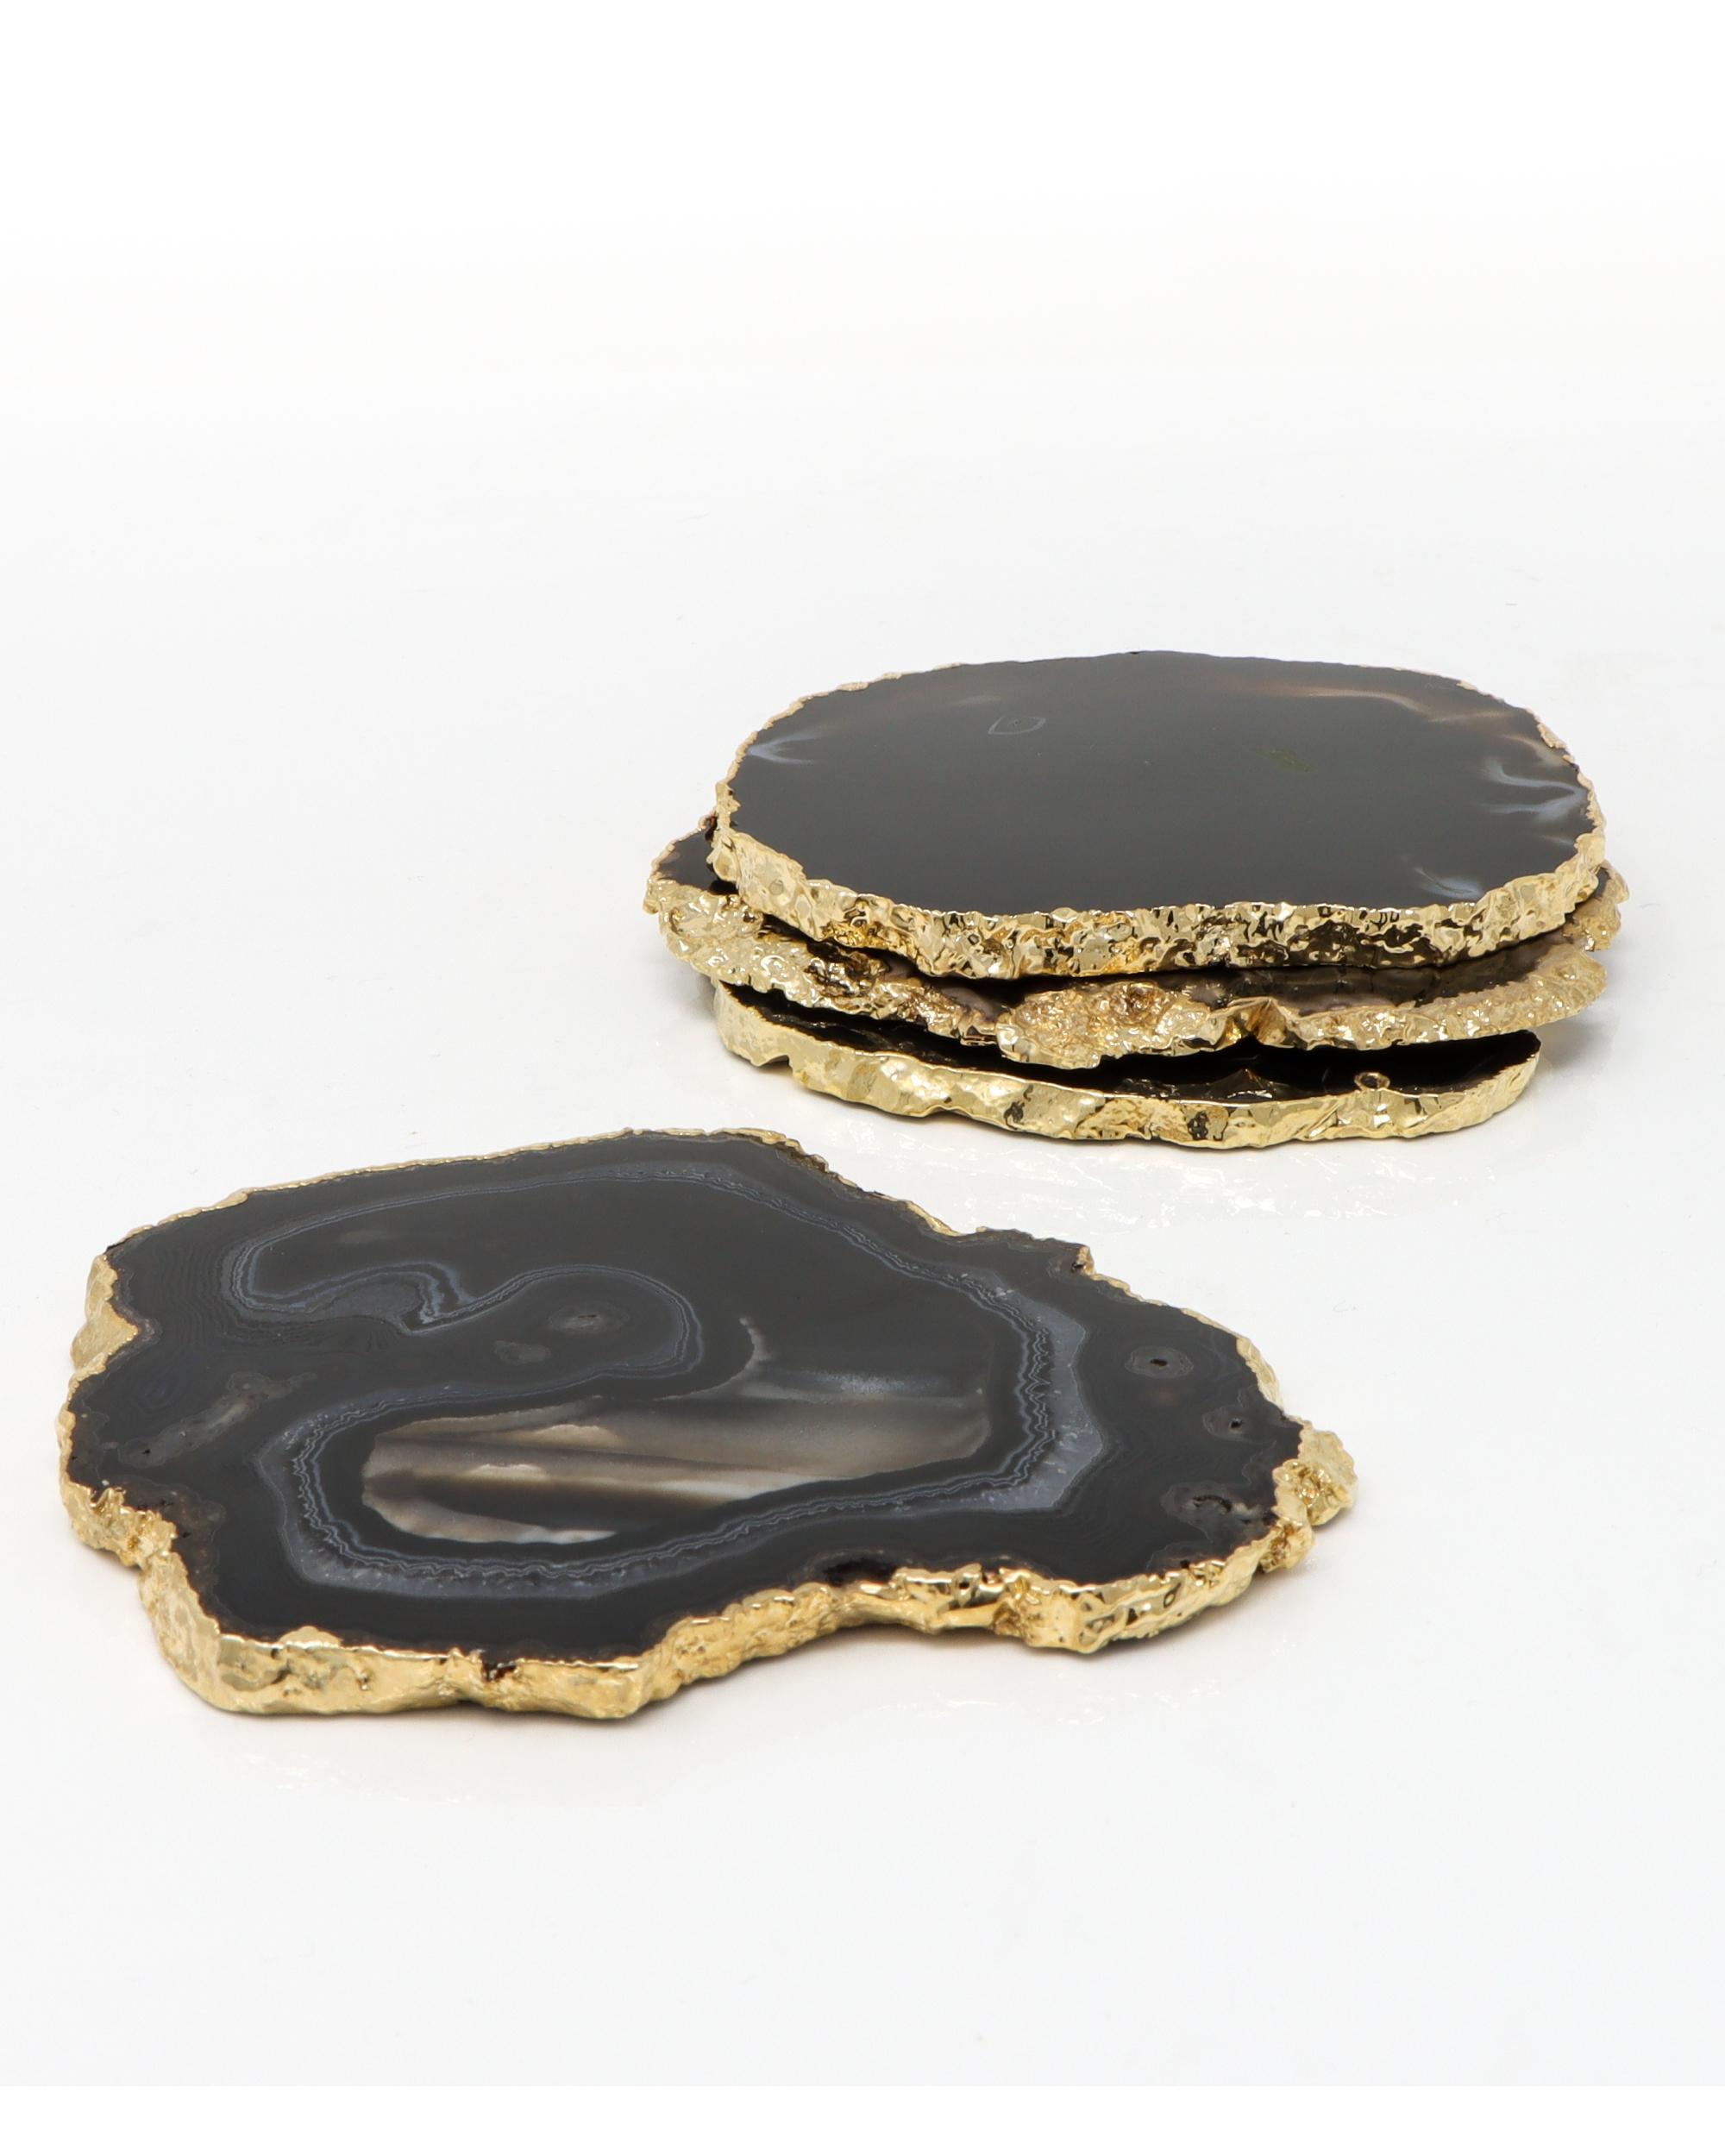 Black Agate Coasters - Set Of Four